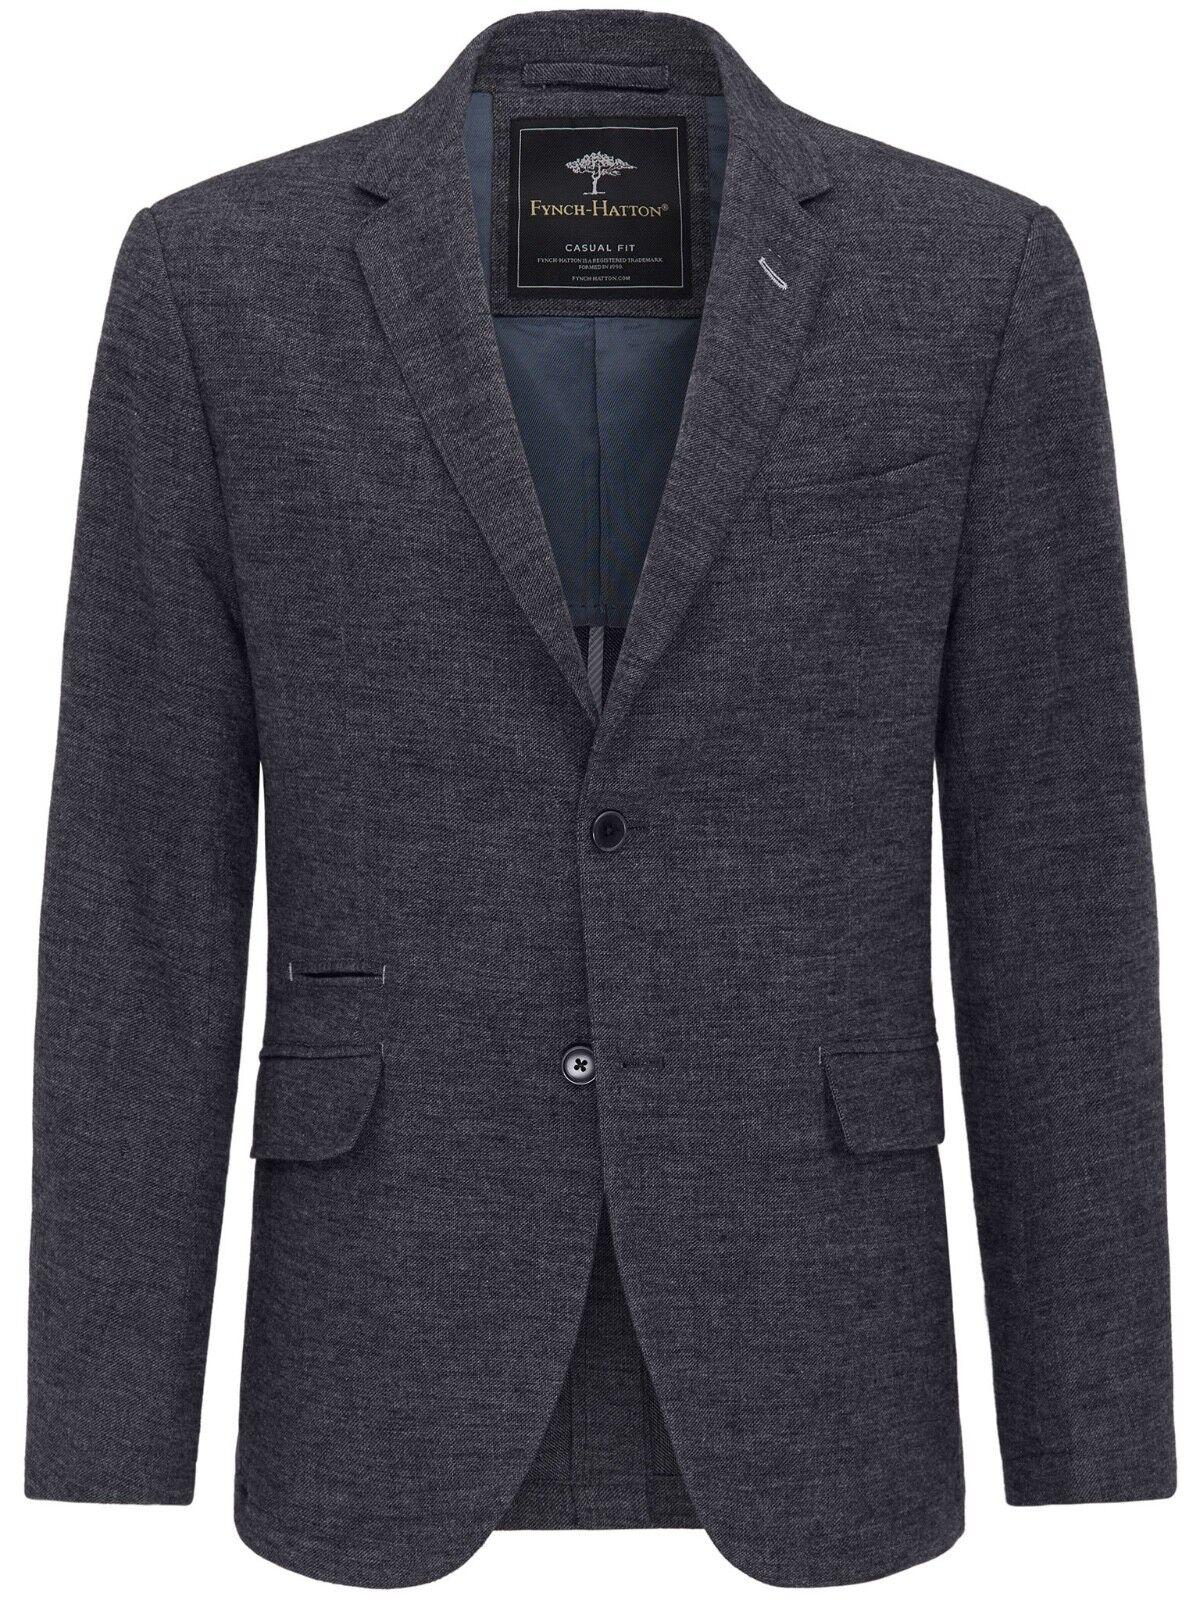 FYNCH HATTON® StructuROT Jersey Blazer/Night - U42/EU52